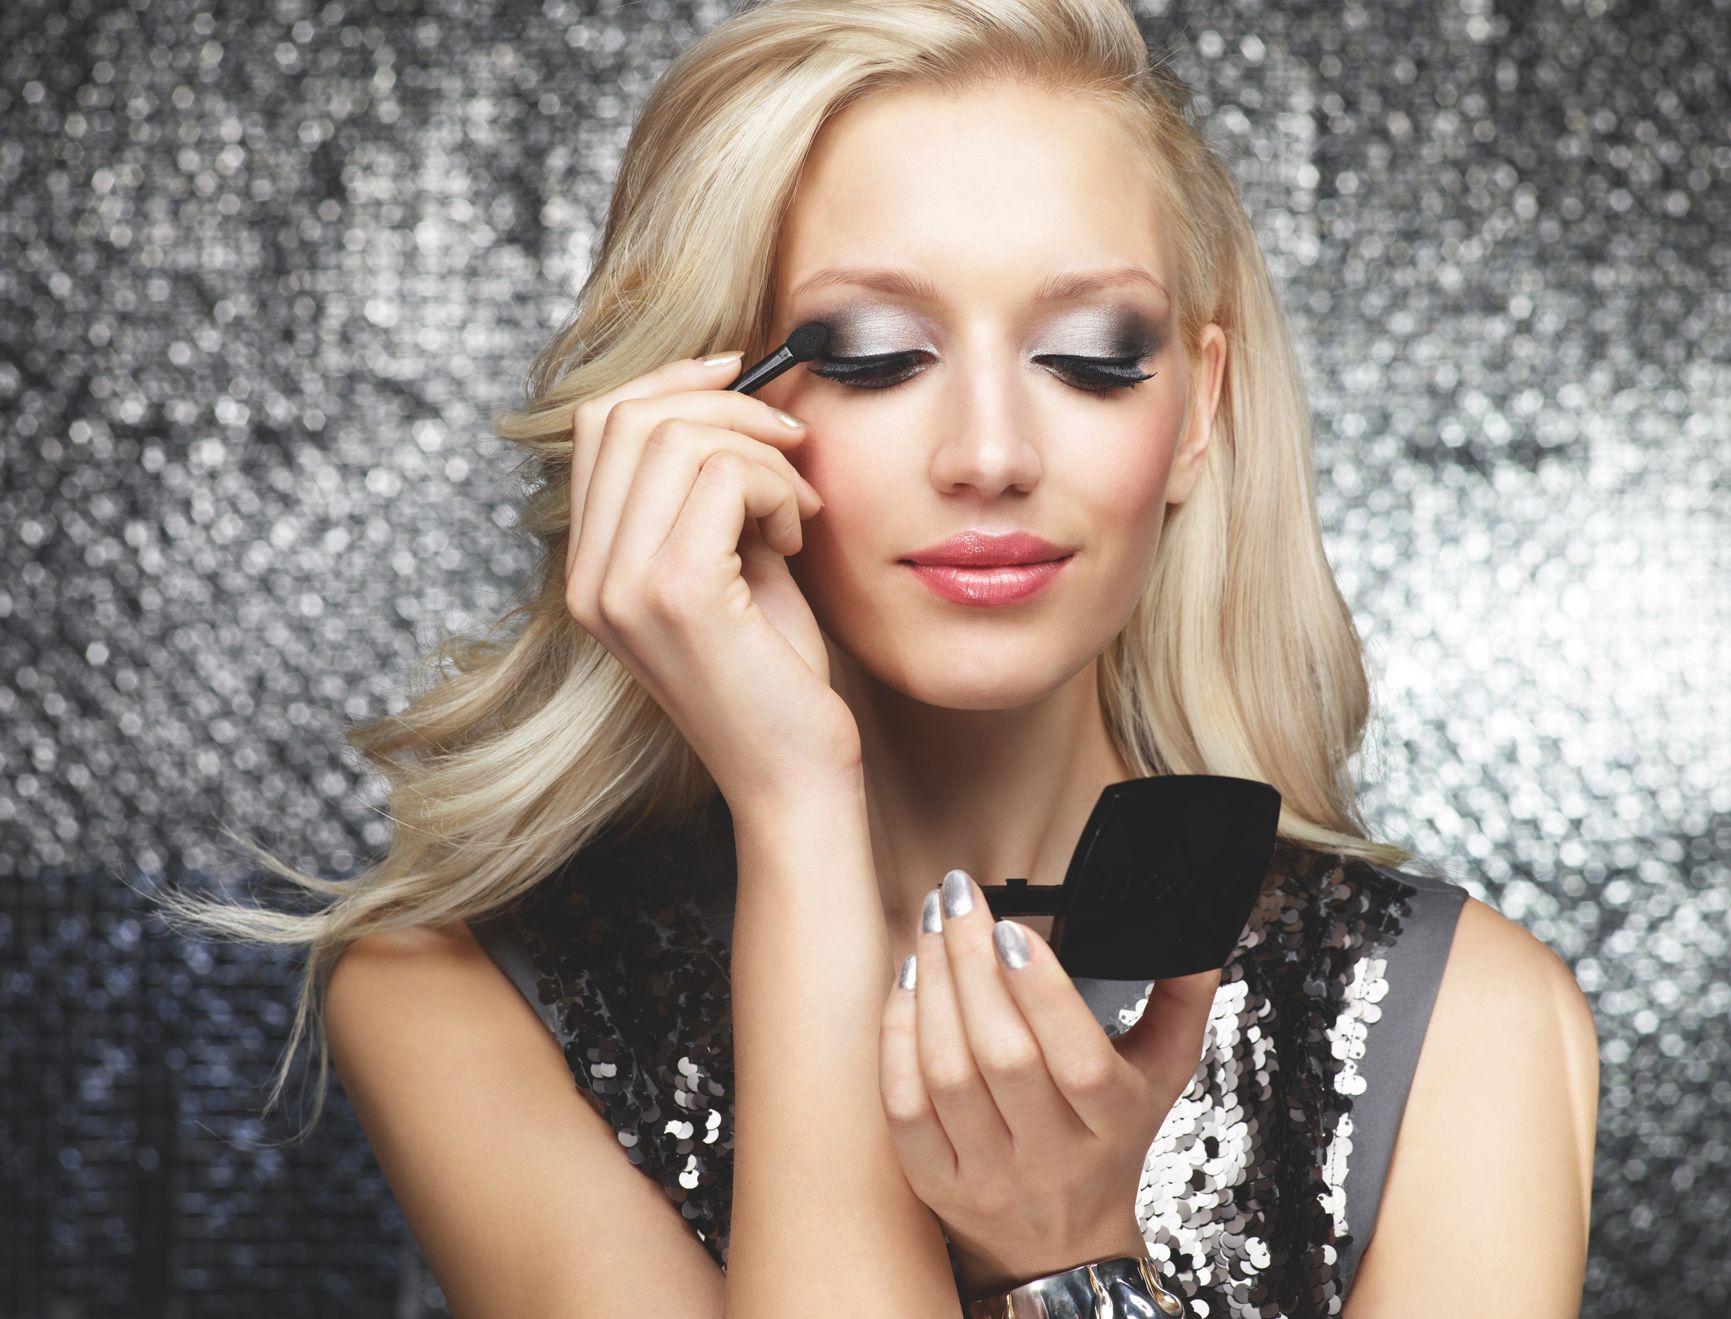 Hopean ja mustan sävyinen juhlameikki #Avon True Color -luomiväriduolla Spacey Silver. Silver and black #party #makeup with Avon True Color #eyeshadow duo in Spacey Silver.